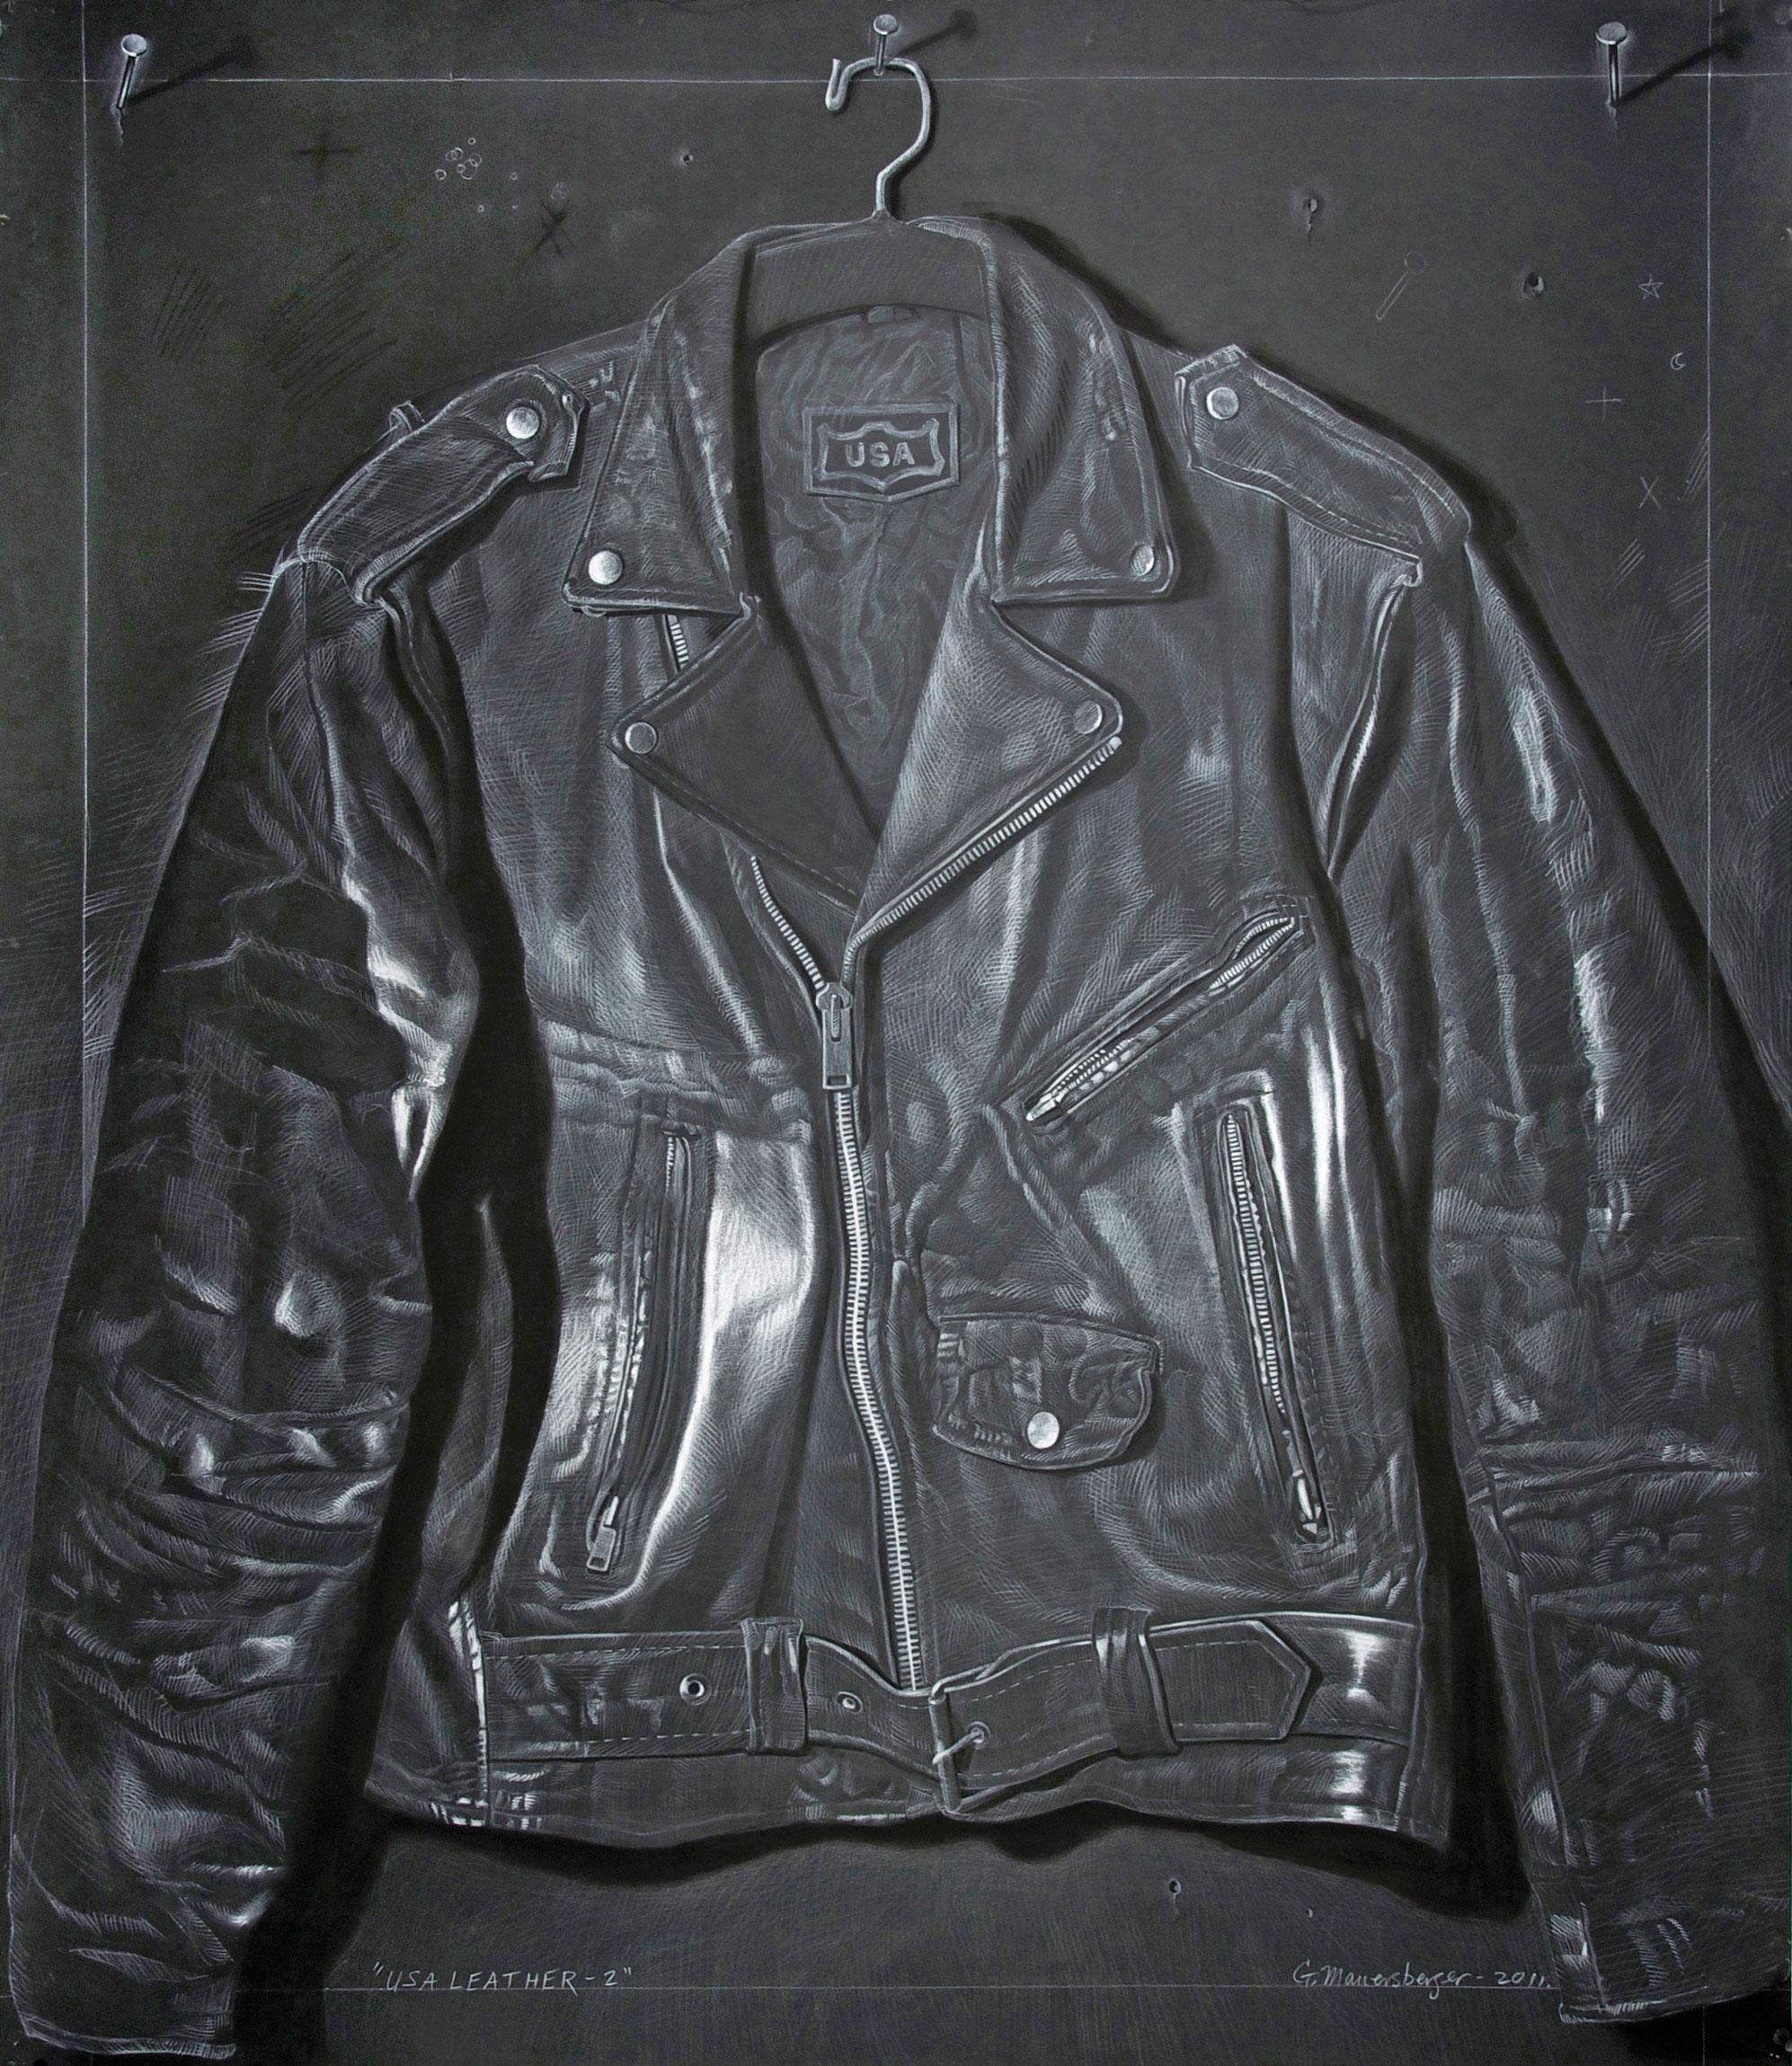 USA Leather 2